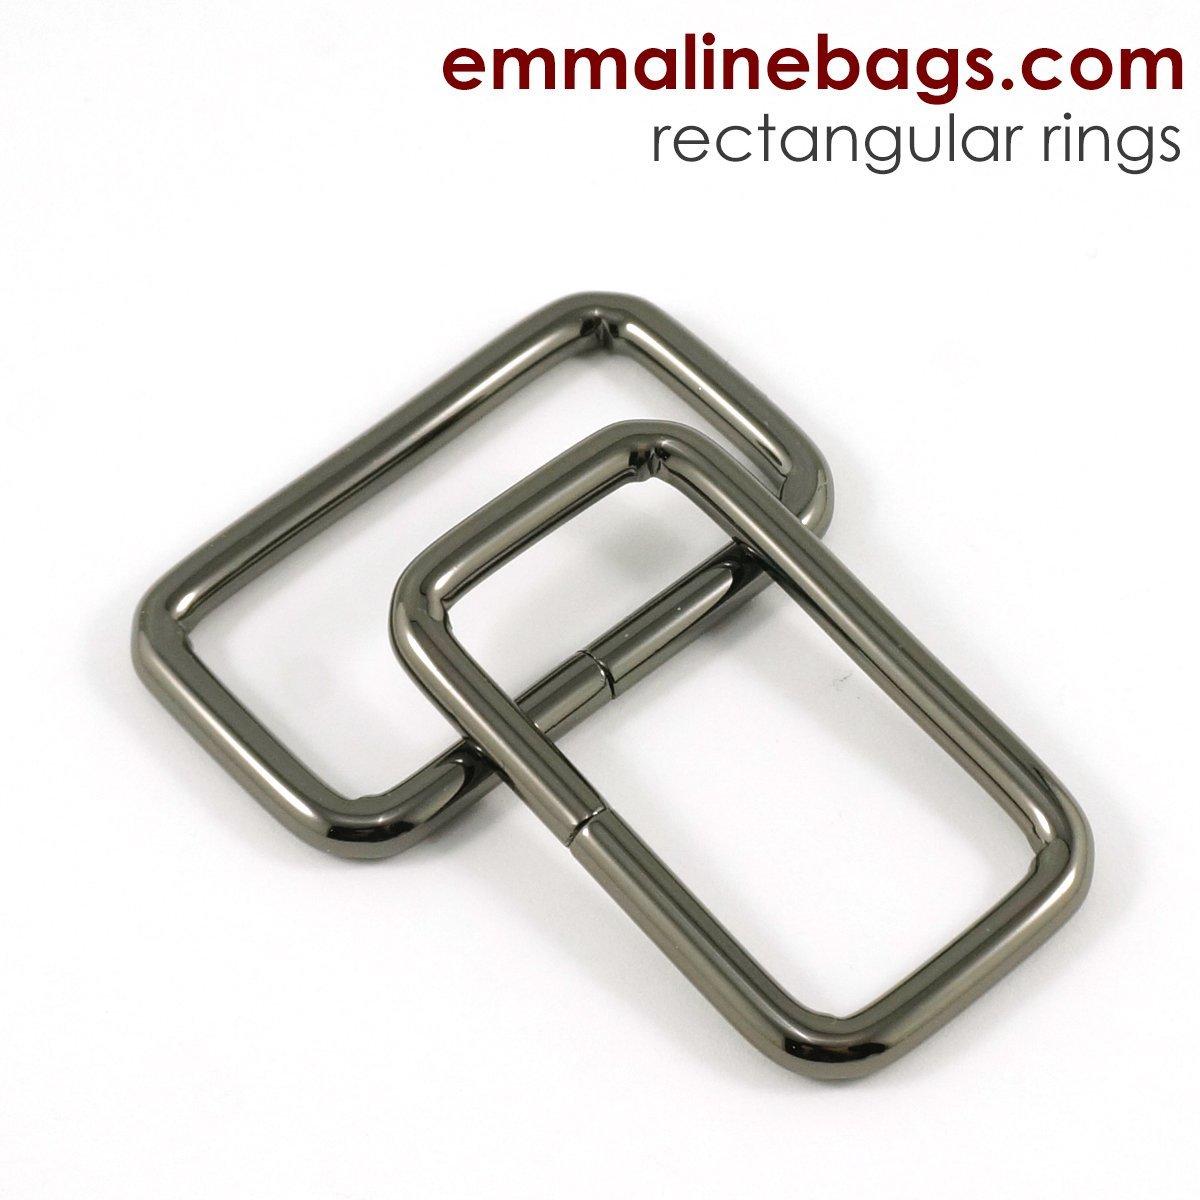 Rectangular Rings (4 pack) 1 1/2 - Gunmetal